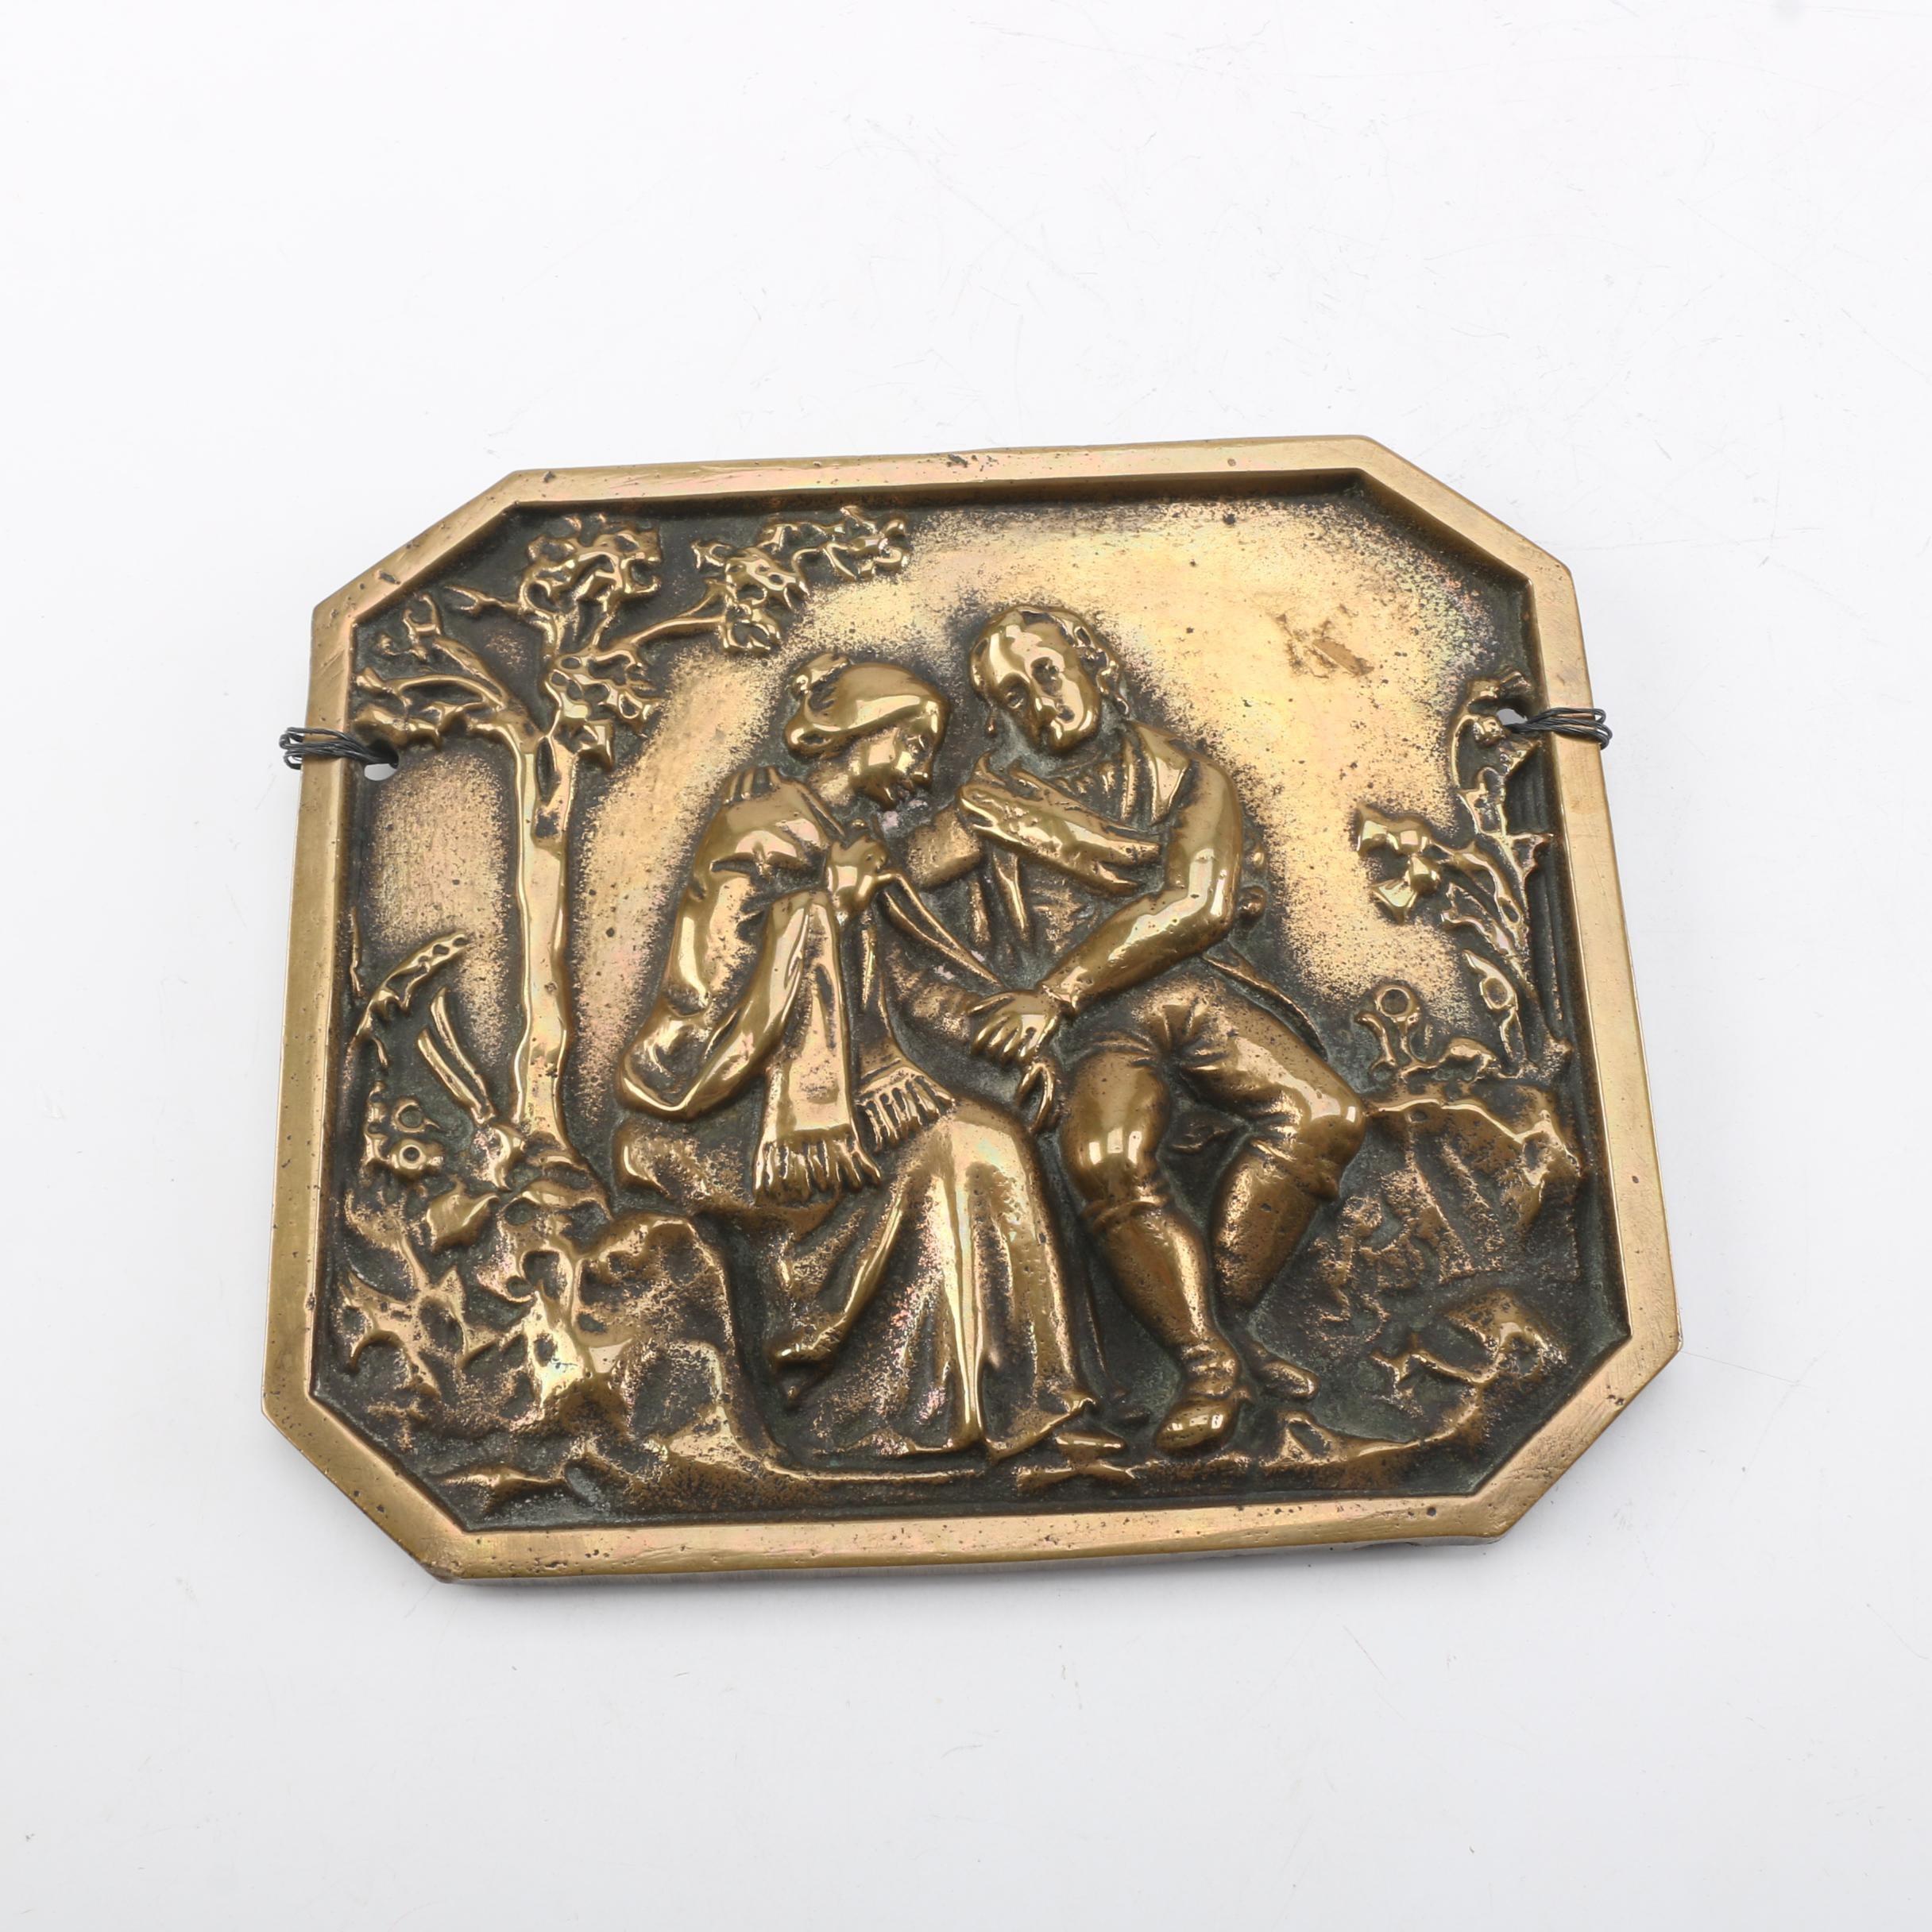 Brass Embossed Plaque